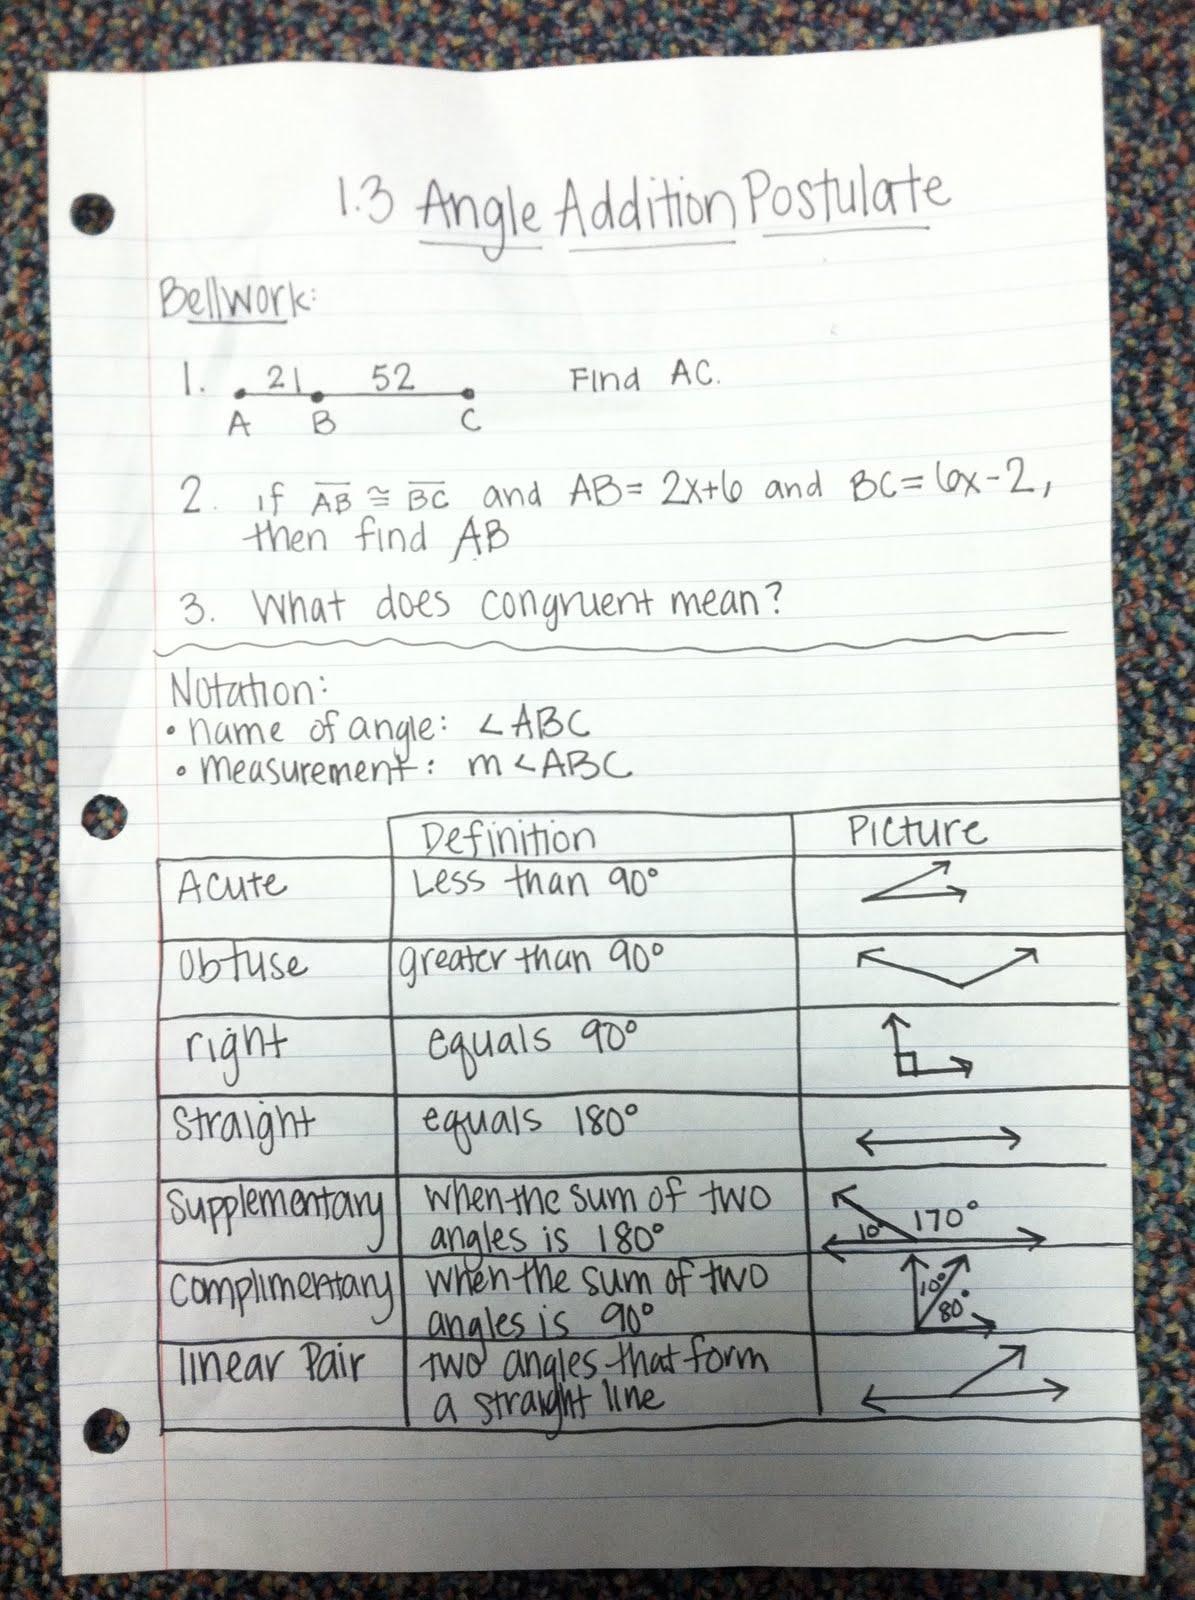 Geometry 1 3 Angle Addition Postulate